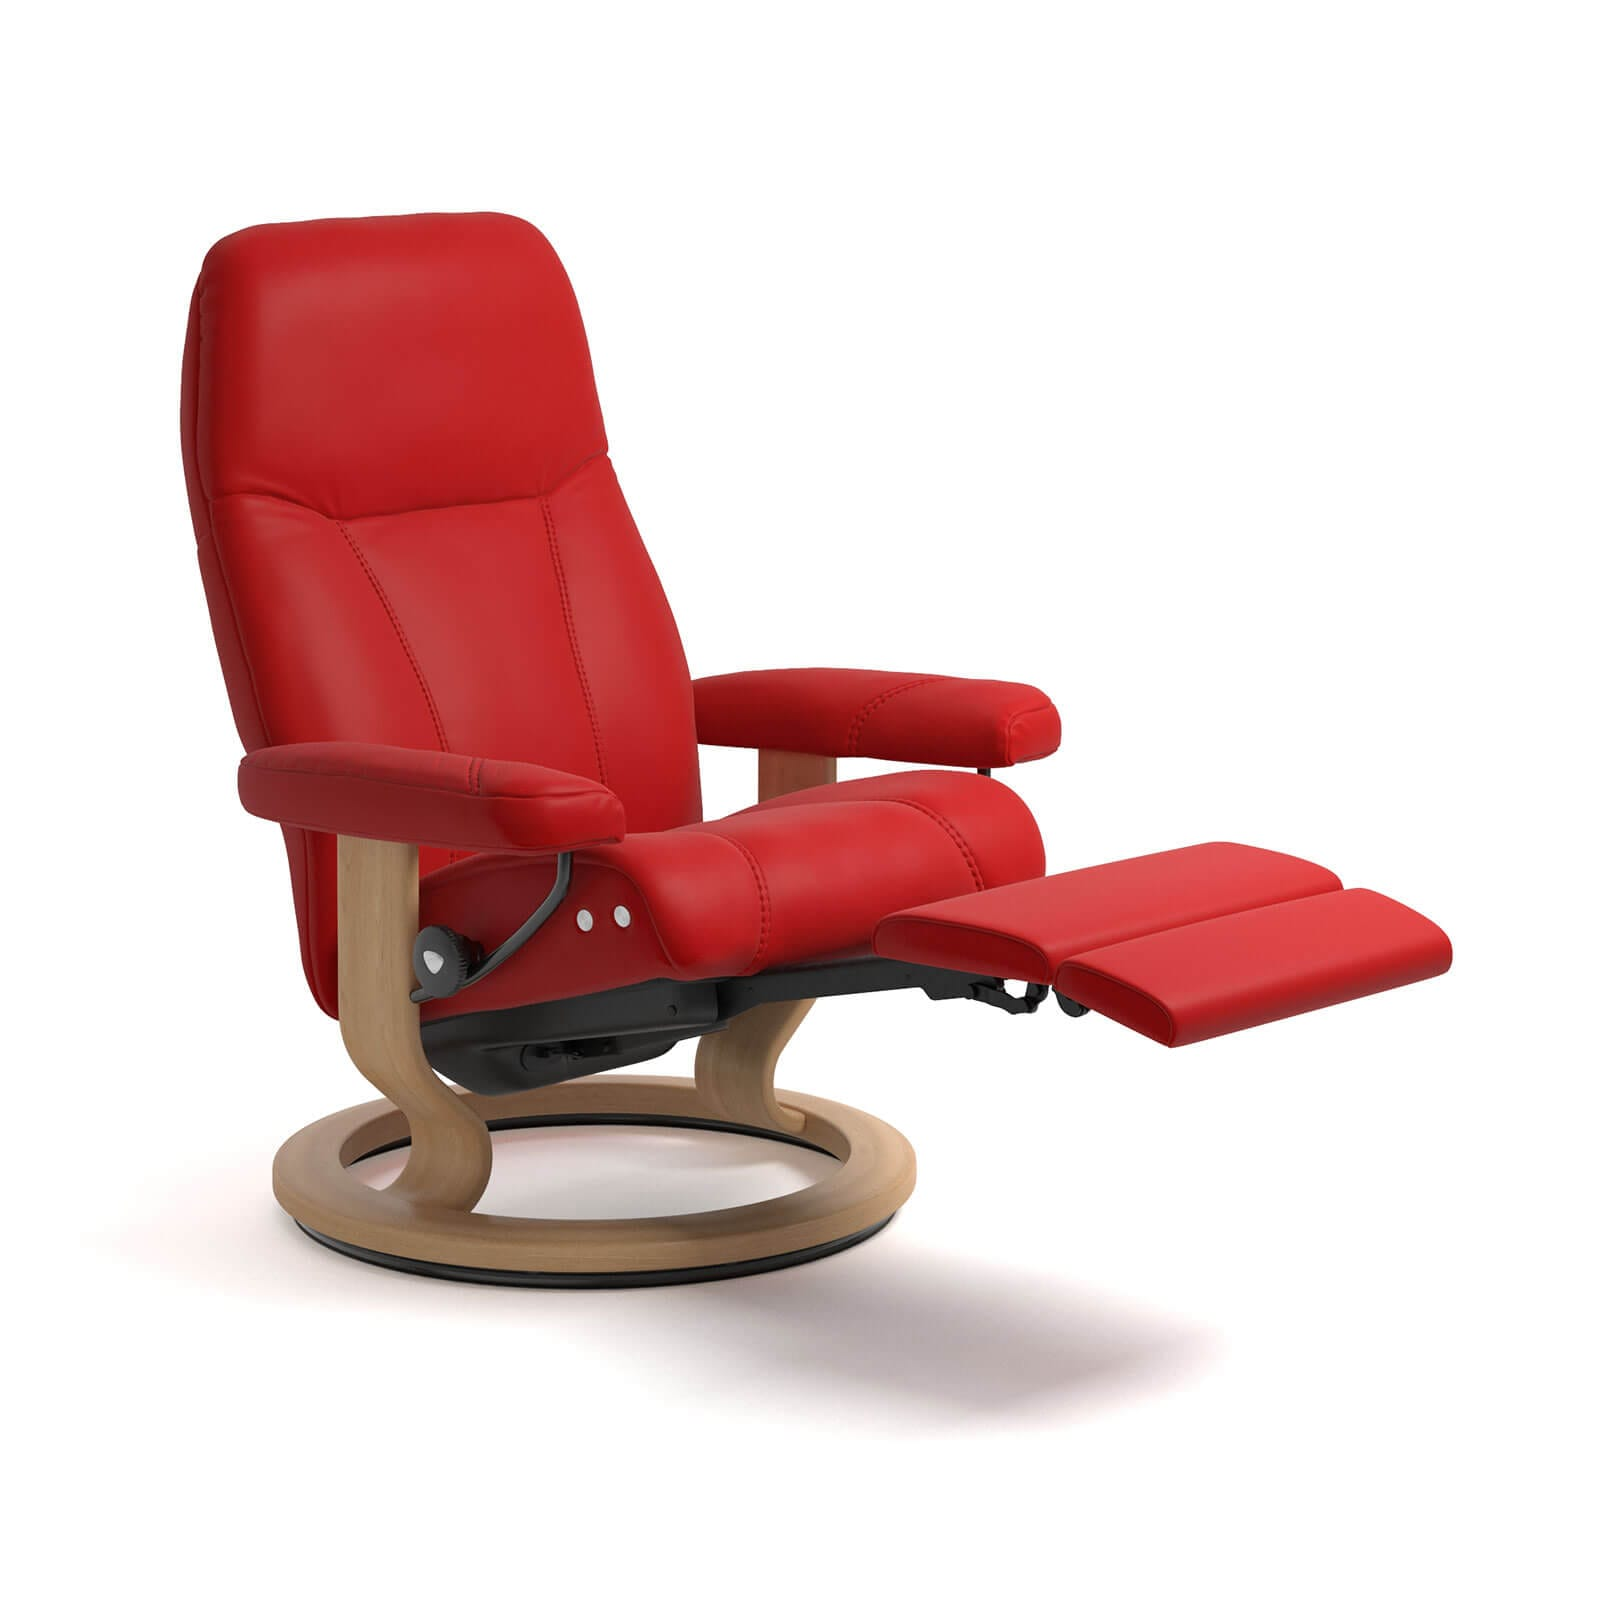 stressless relaxsessel consul legcomfort leder batick. Black Bedroom Furniture Sets. Home Design Ideas